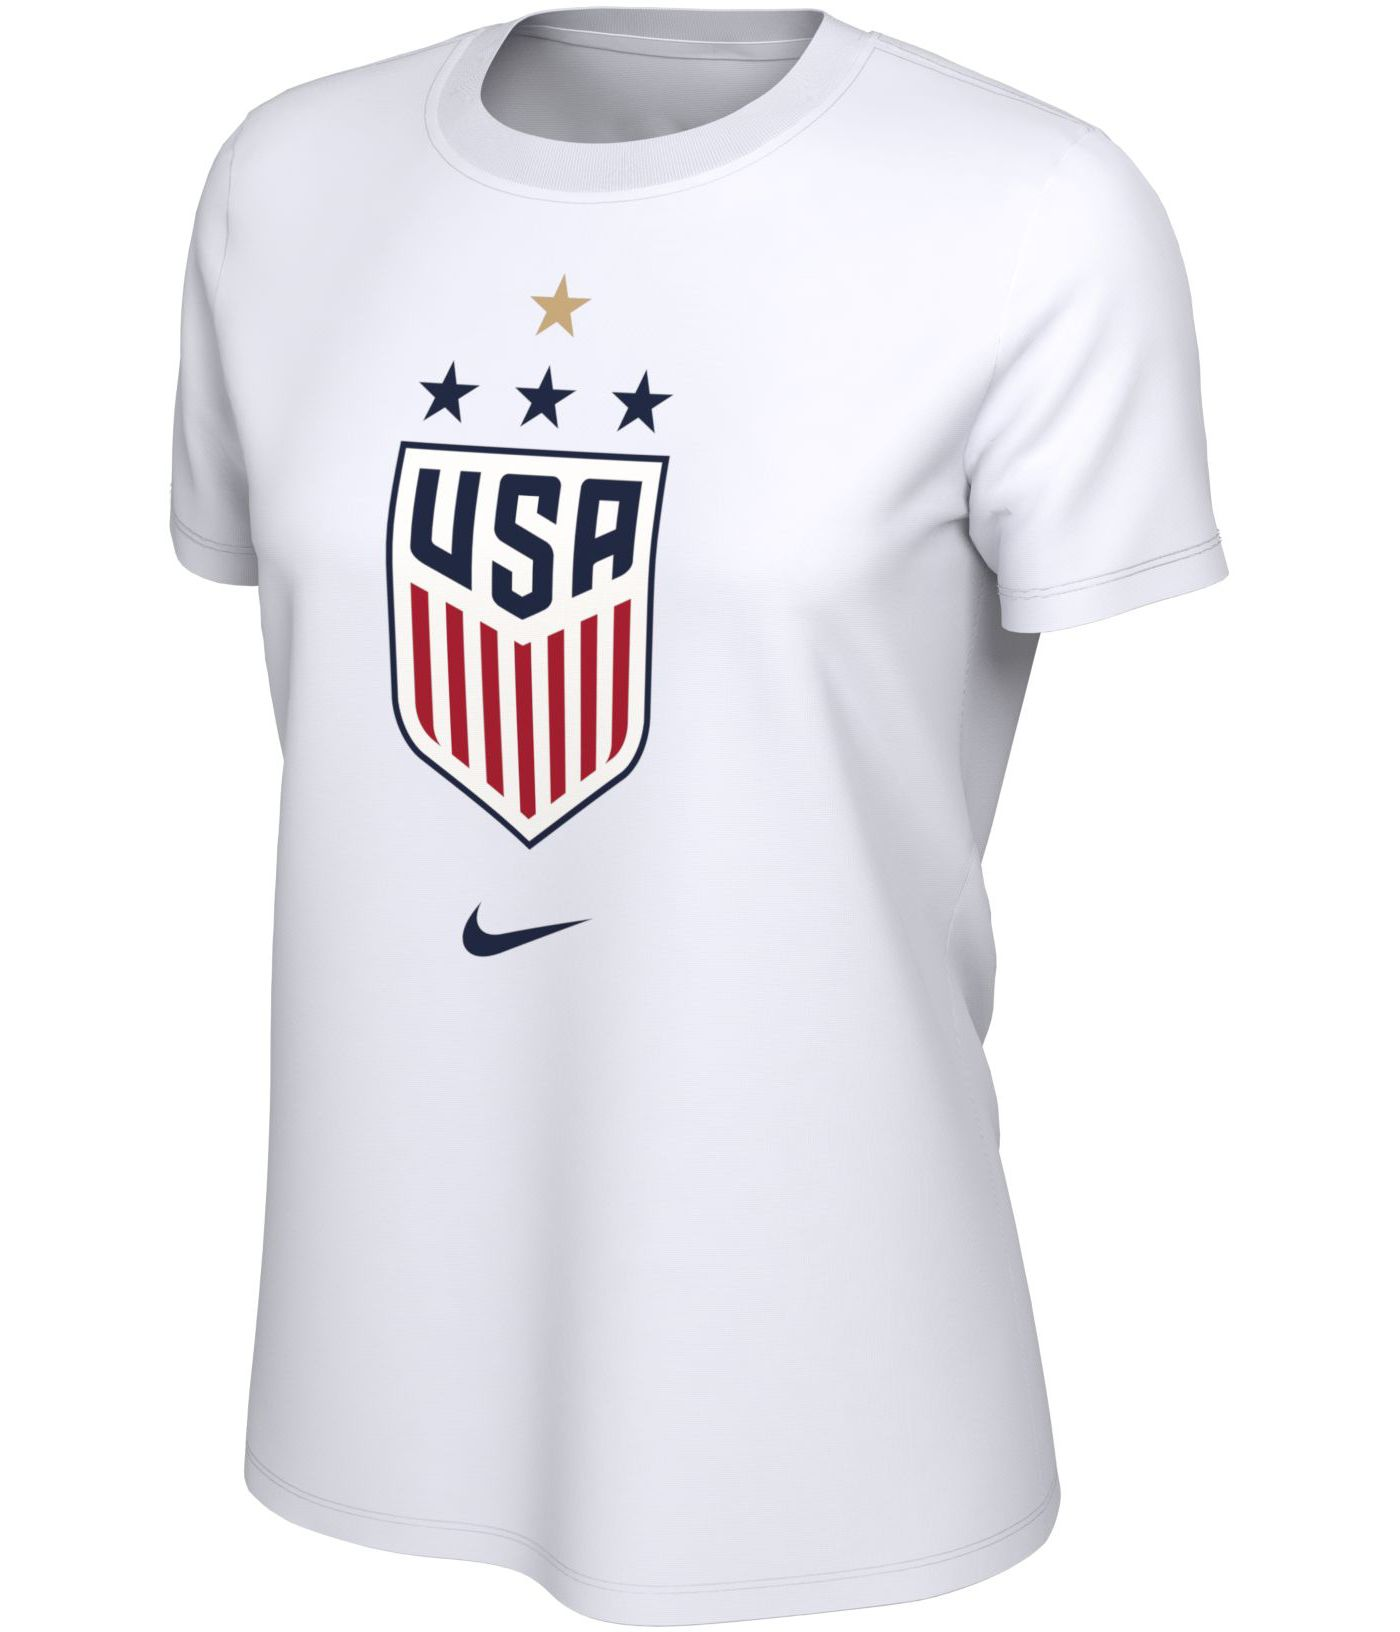 Nike Women's 2019 FIFA Women's World Cup Champions USA Soccer 4-Star White T-Shirt